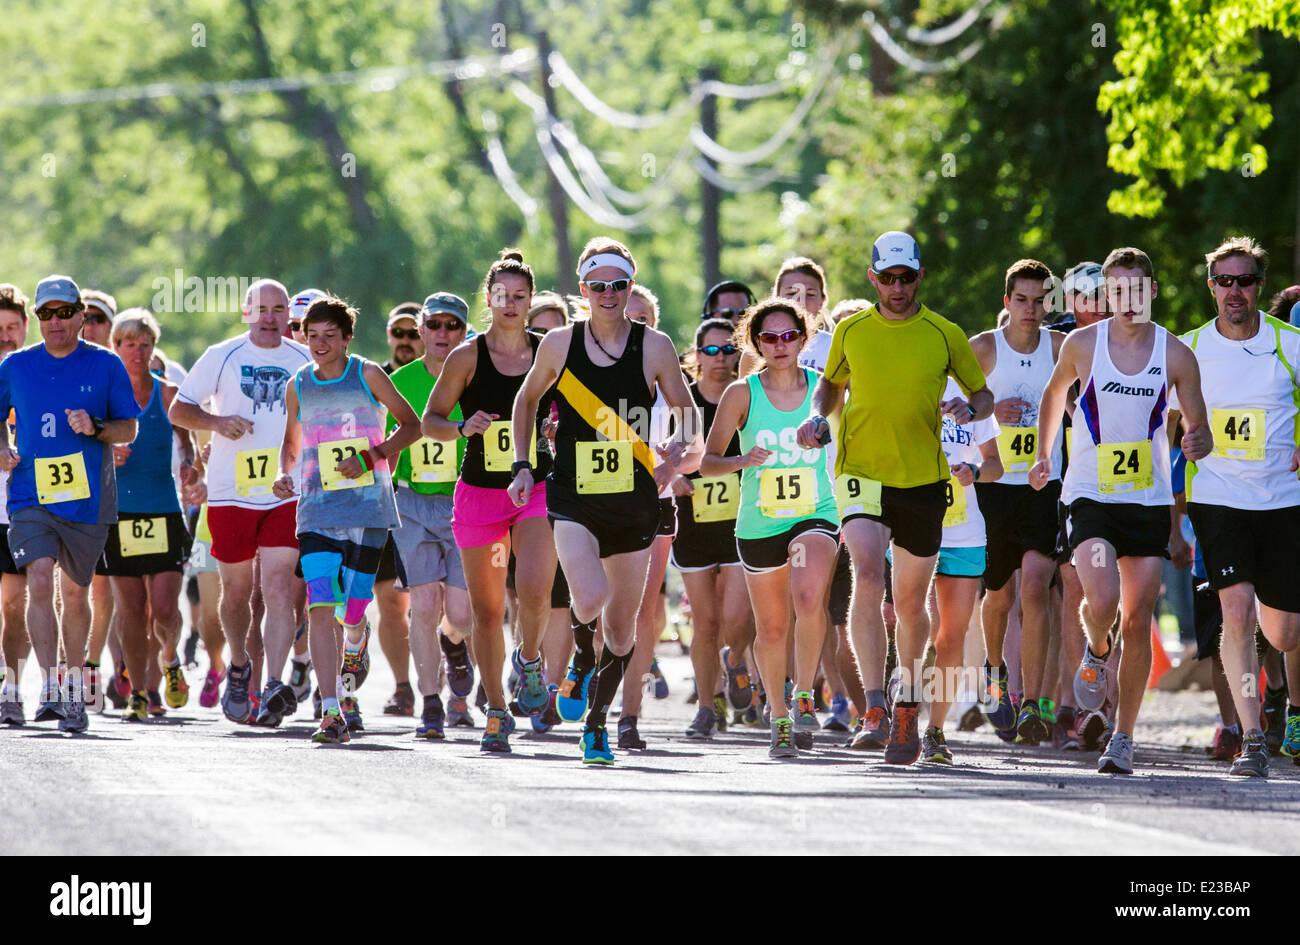 Runners race in 5K & 10K foot races, annual Fibark festival, Salida, Colorado, USA - Stock Image